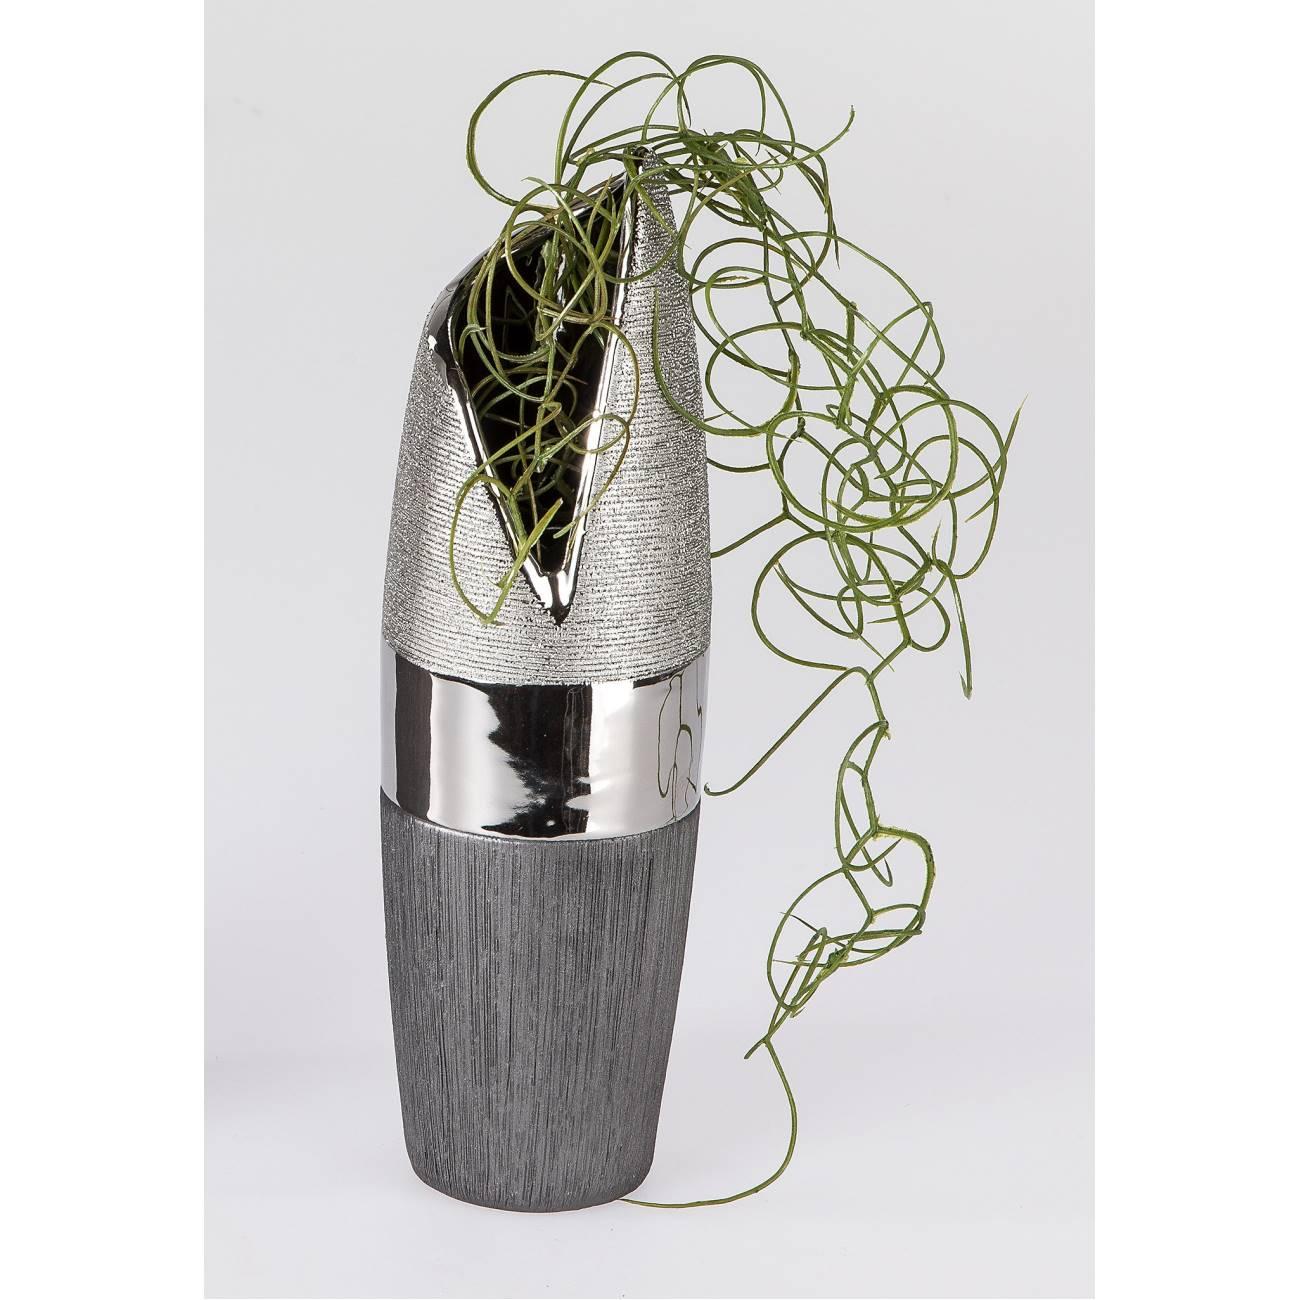 deko vase luxor h 30cm d 10cm silber grau keramik formano ebay. Black Bedroom Furniture Sets. Home Design Ideas